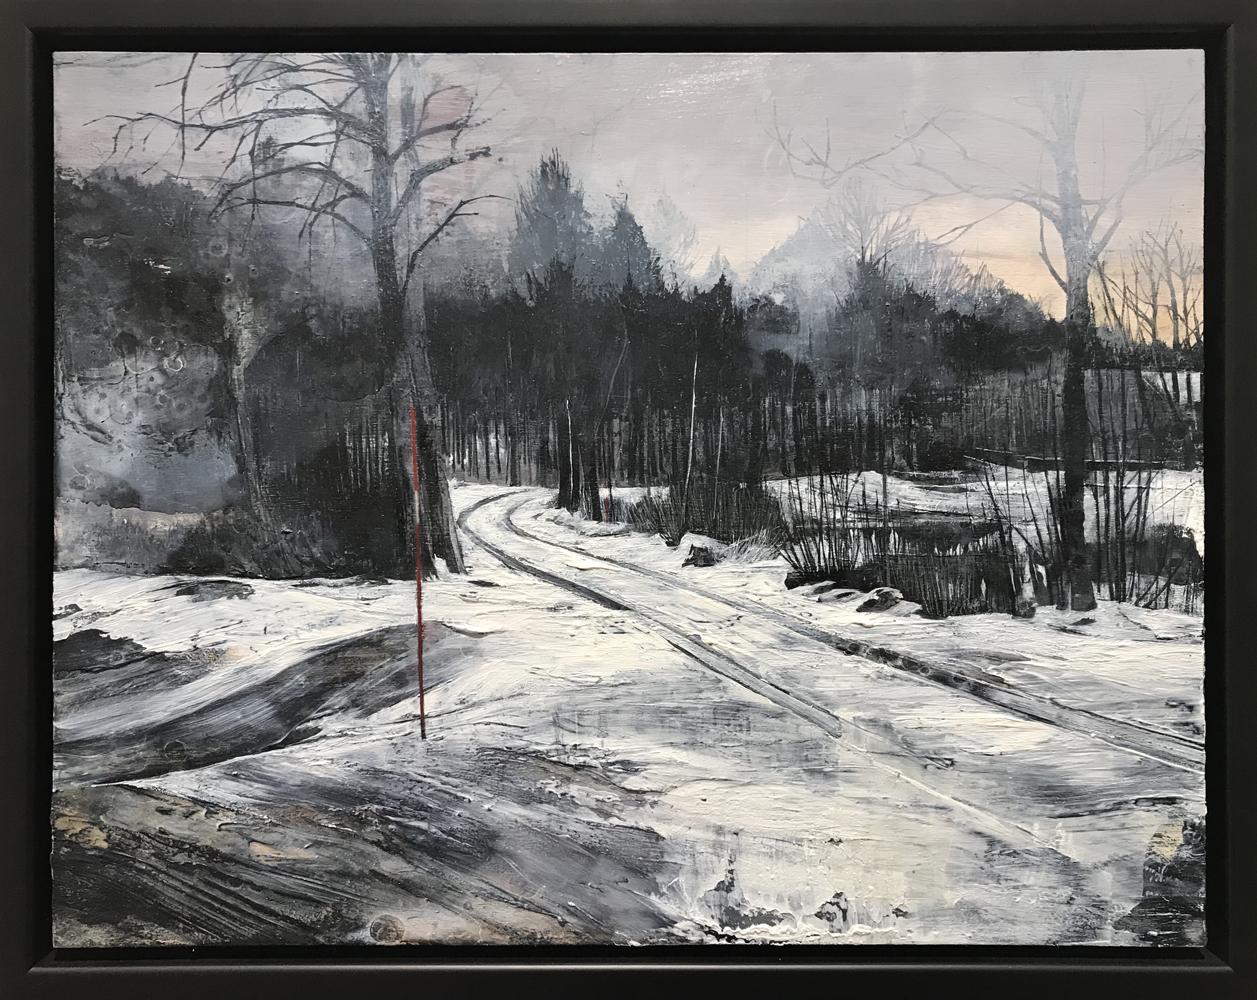 Mark Thompson, Forgiving, 2020, oil on panel, 14 x 18 inches, framed, $2000.